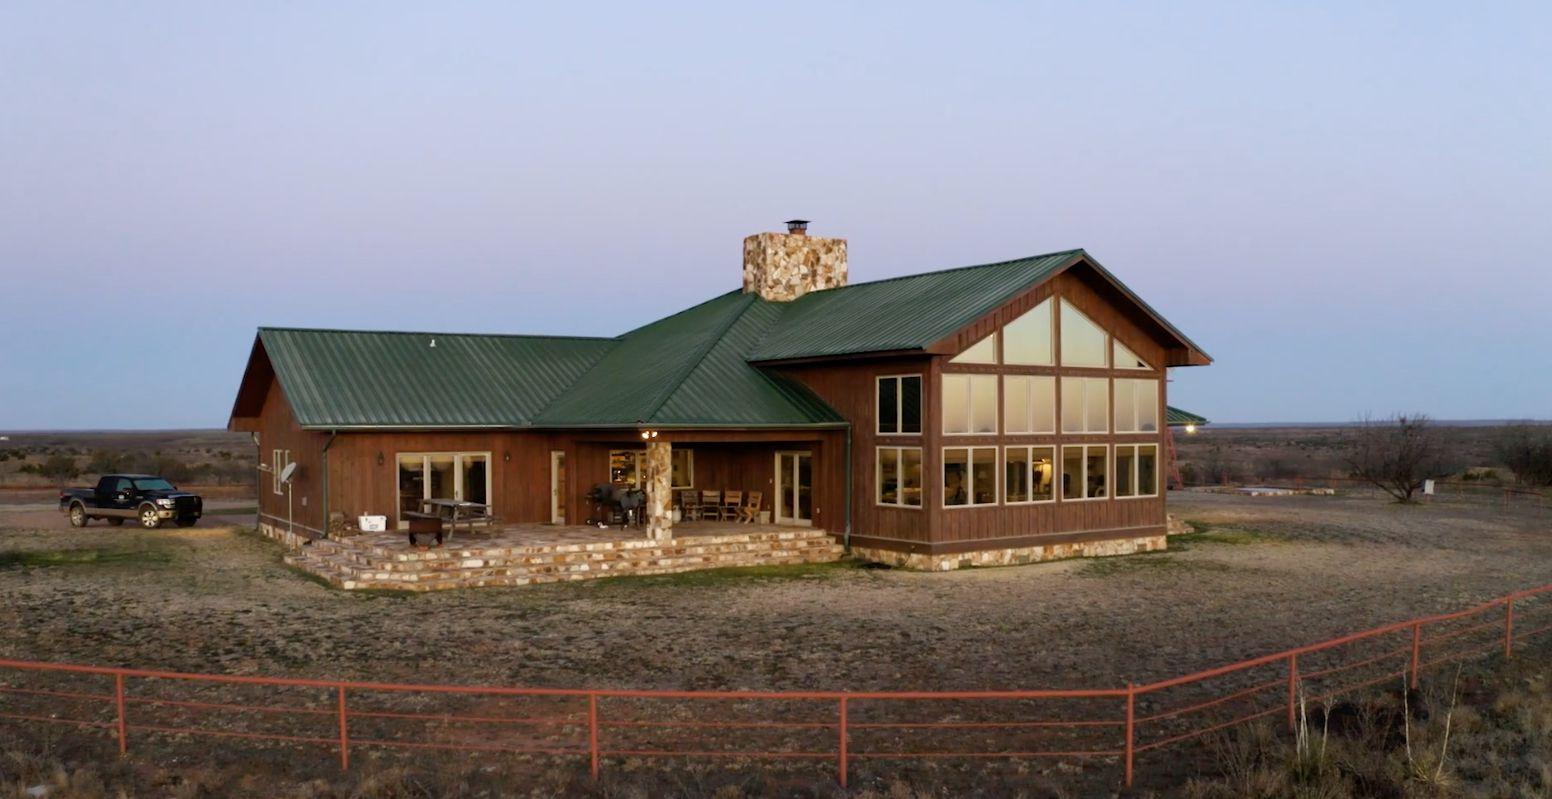 Caloosa Ranch includes a 4,700-square-foot main lodge.